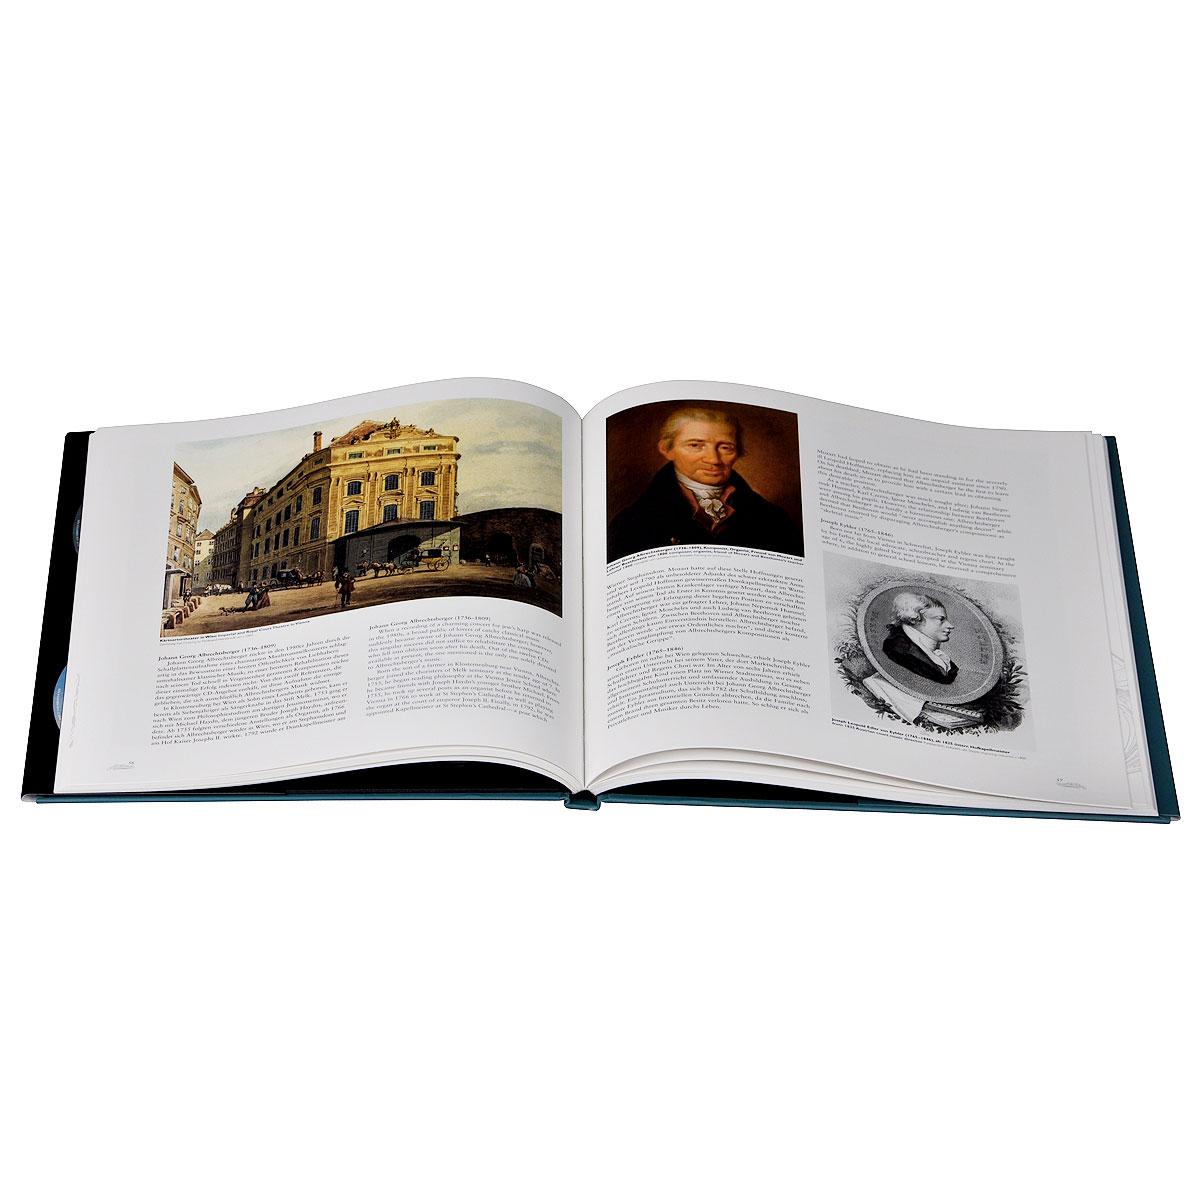 Beethoven: Ein Biografischer Bilderbogen / A Biographical Kaleidoscope (+ 4 CD)